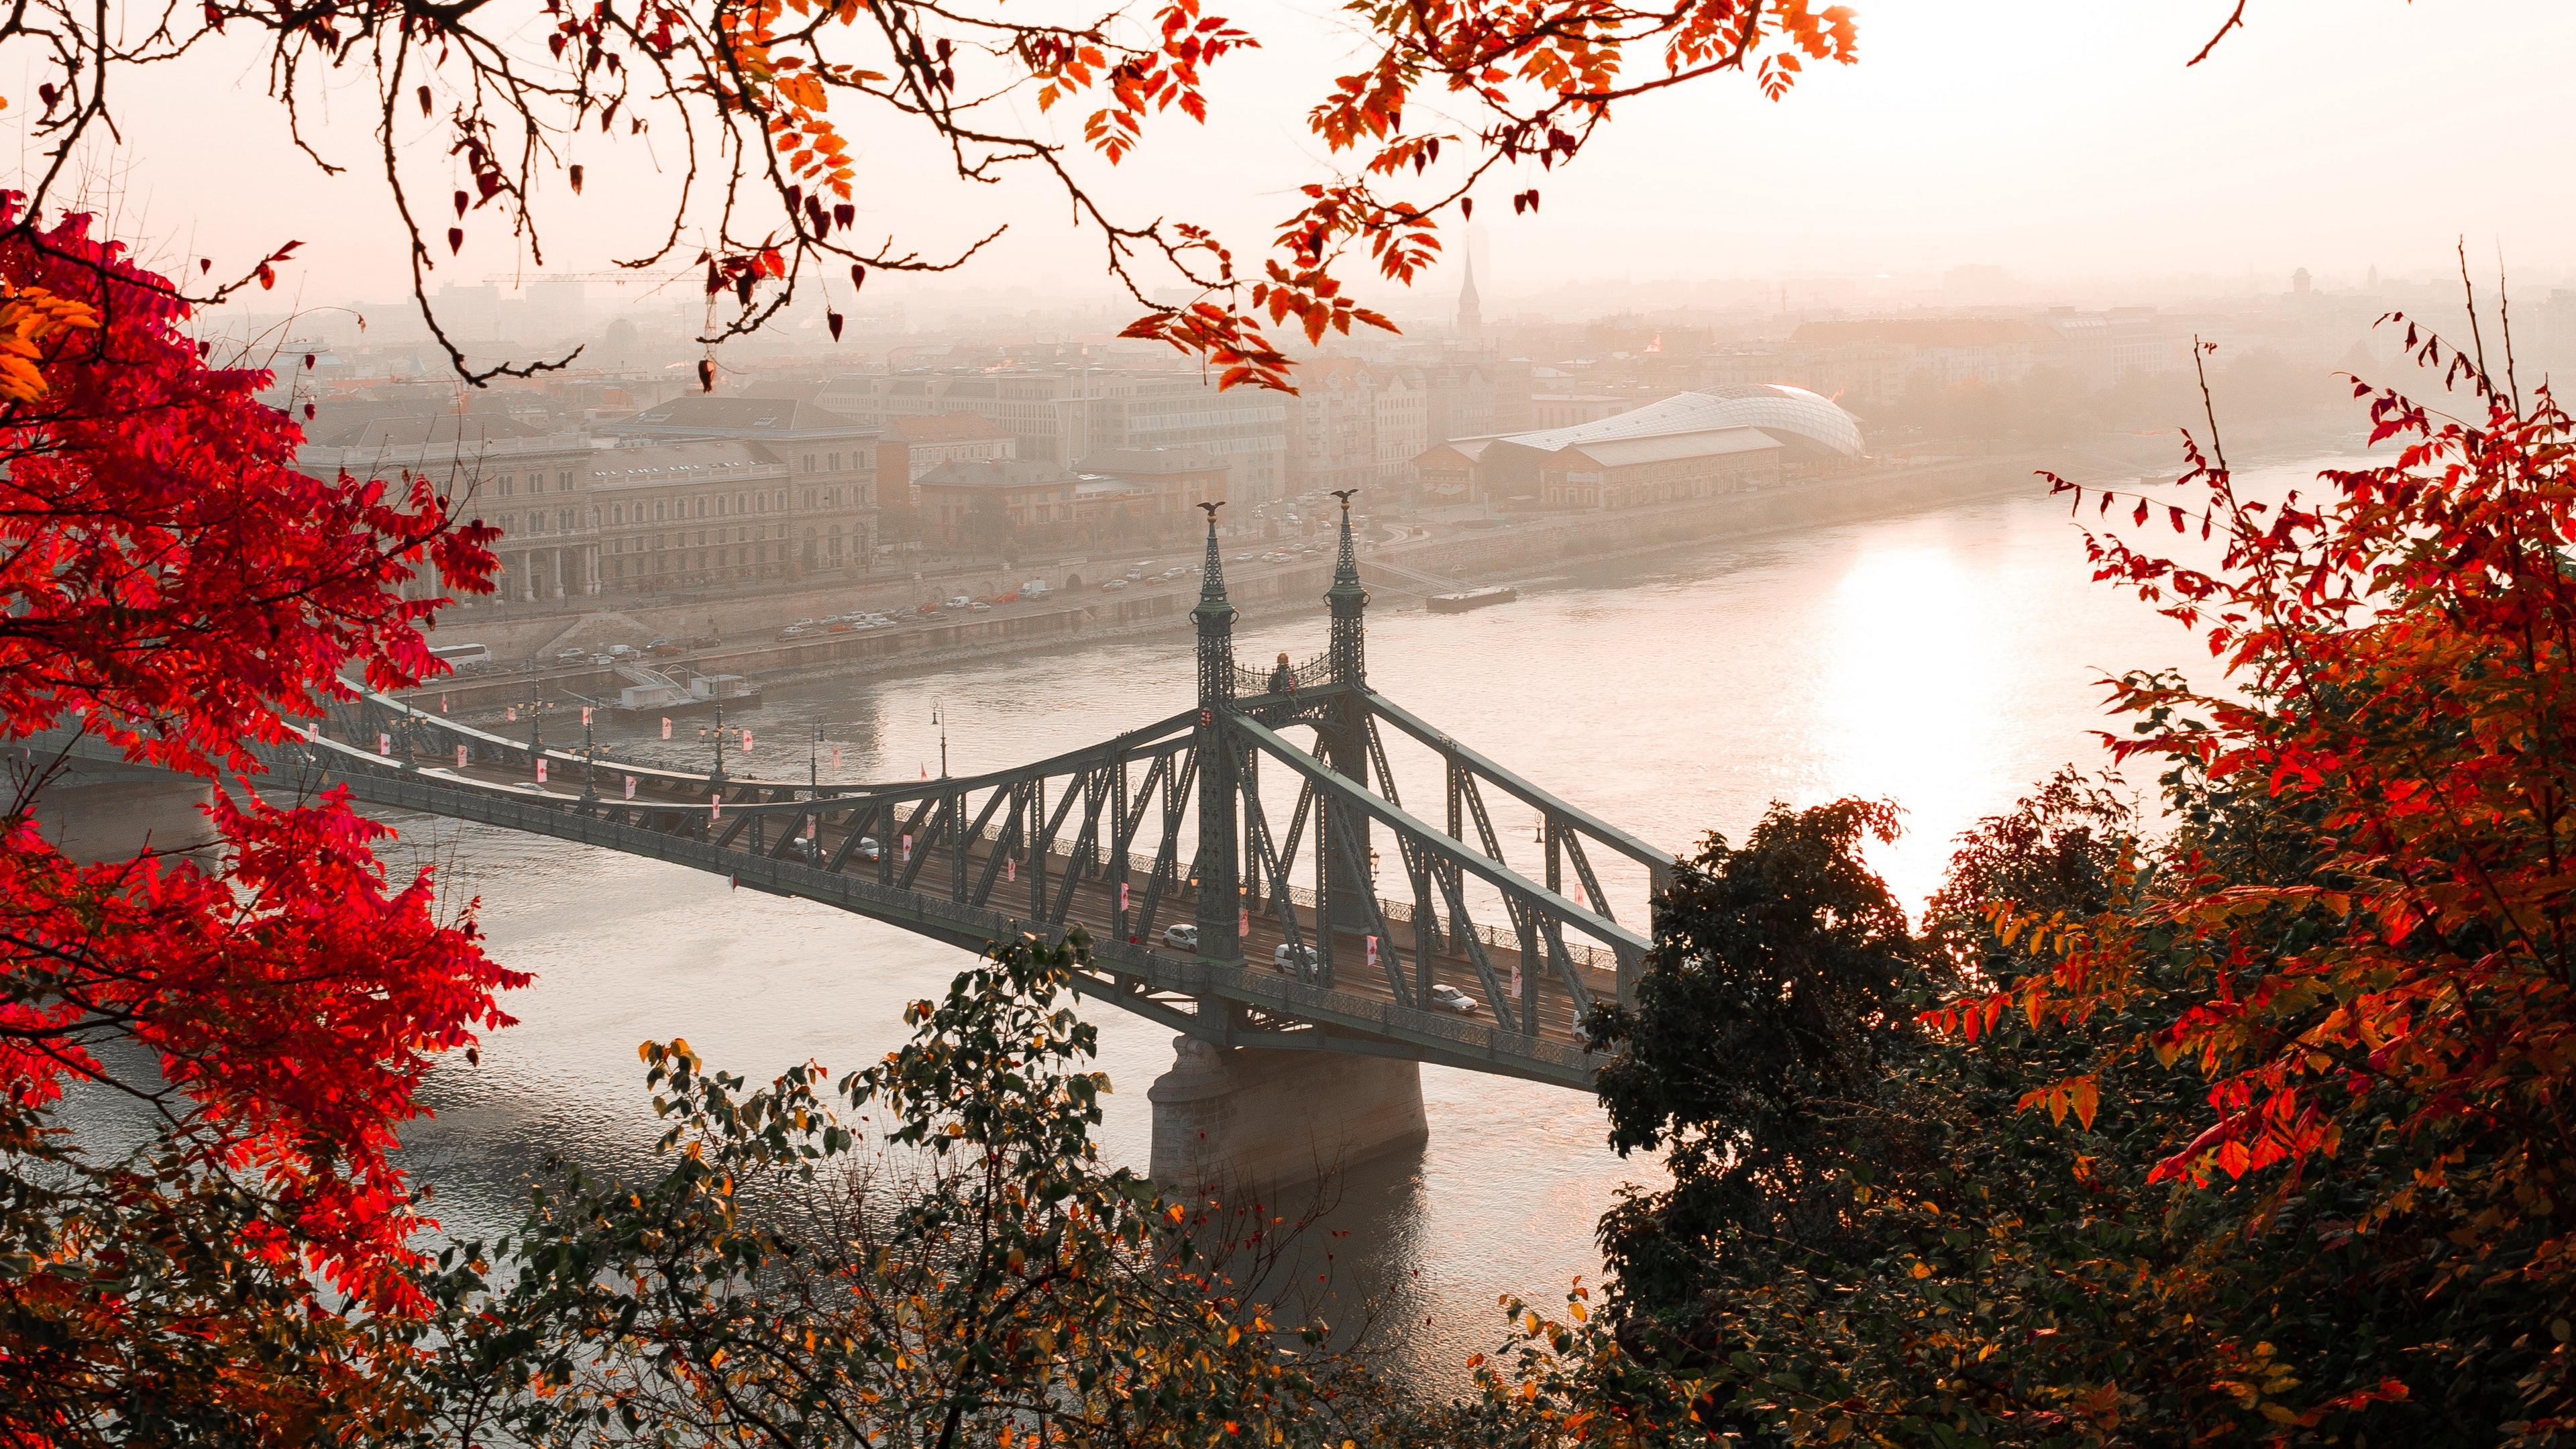 bridge autumn city citadella budapest hungary 4k 1538068184 - bridge, autumn, city, citadella, budapest, hungary 4k - City, bridge, Autumn